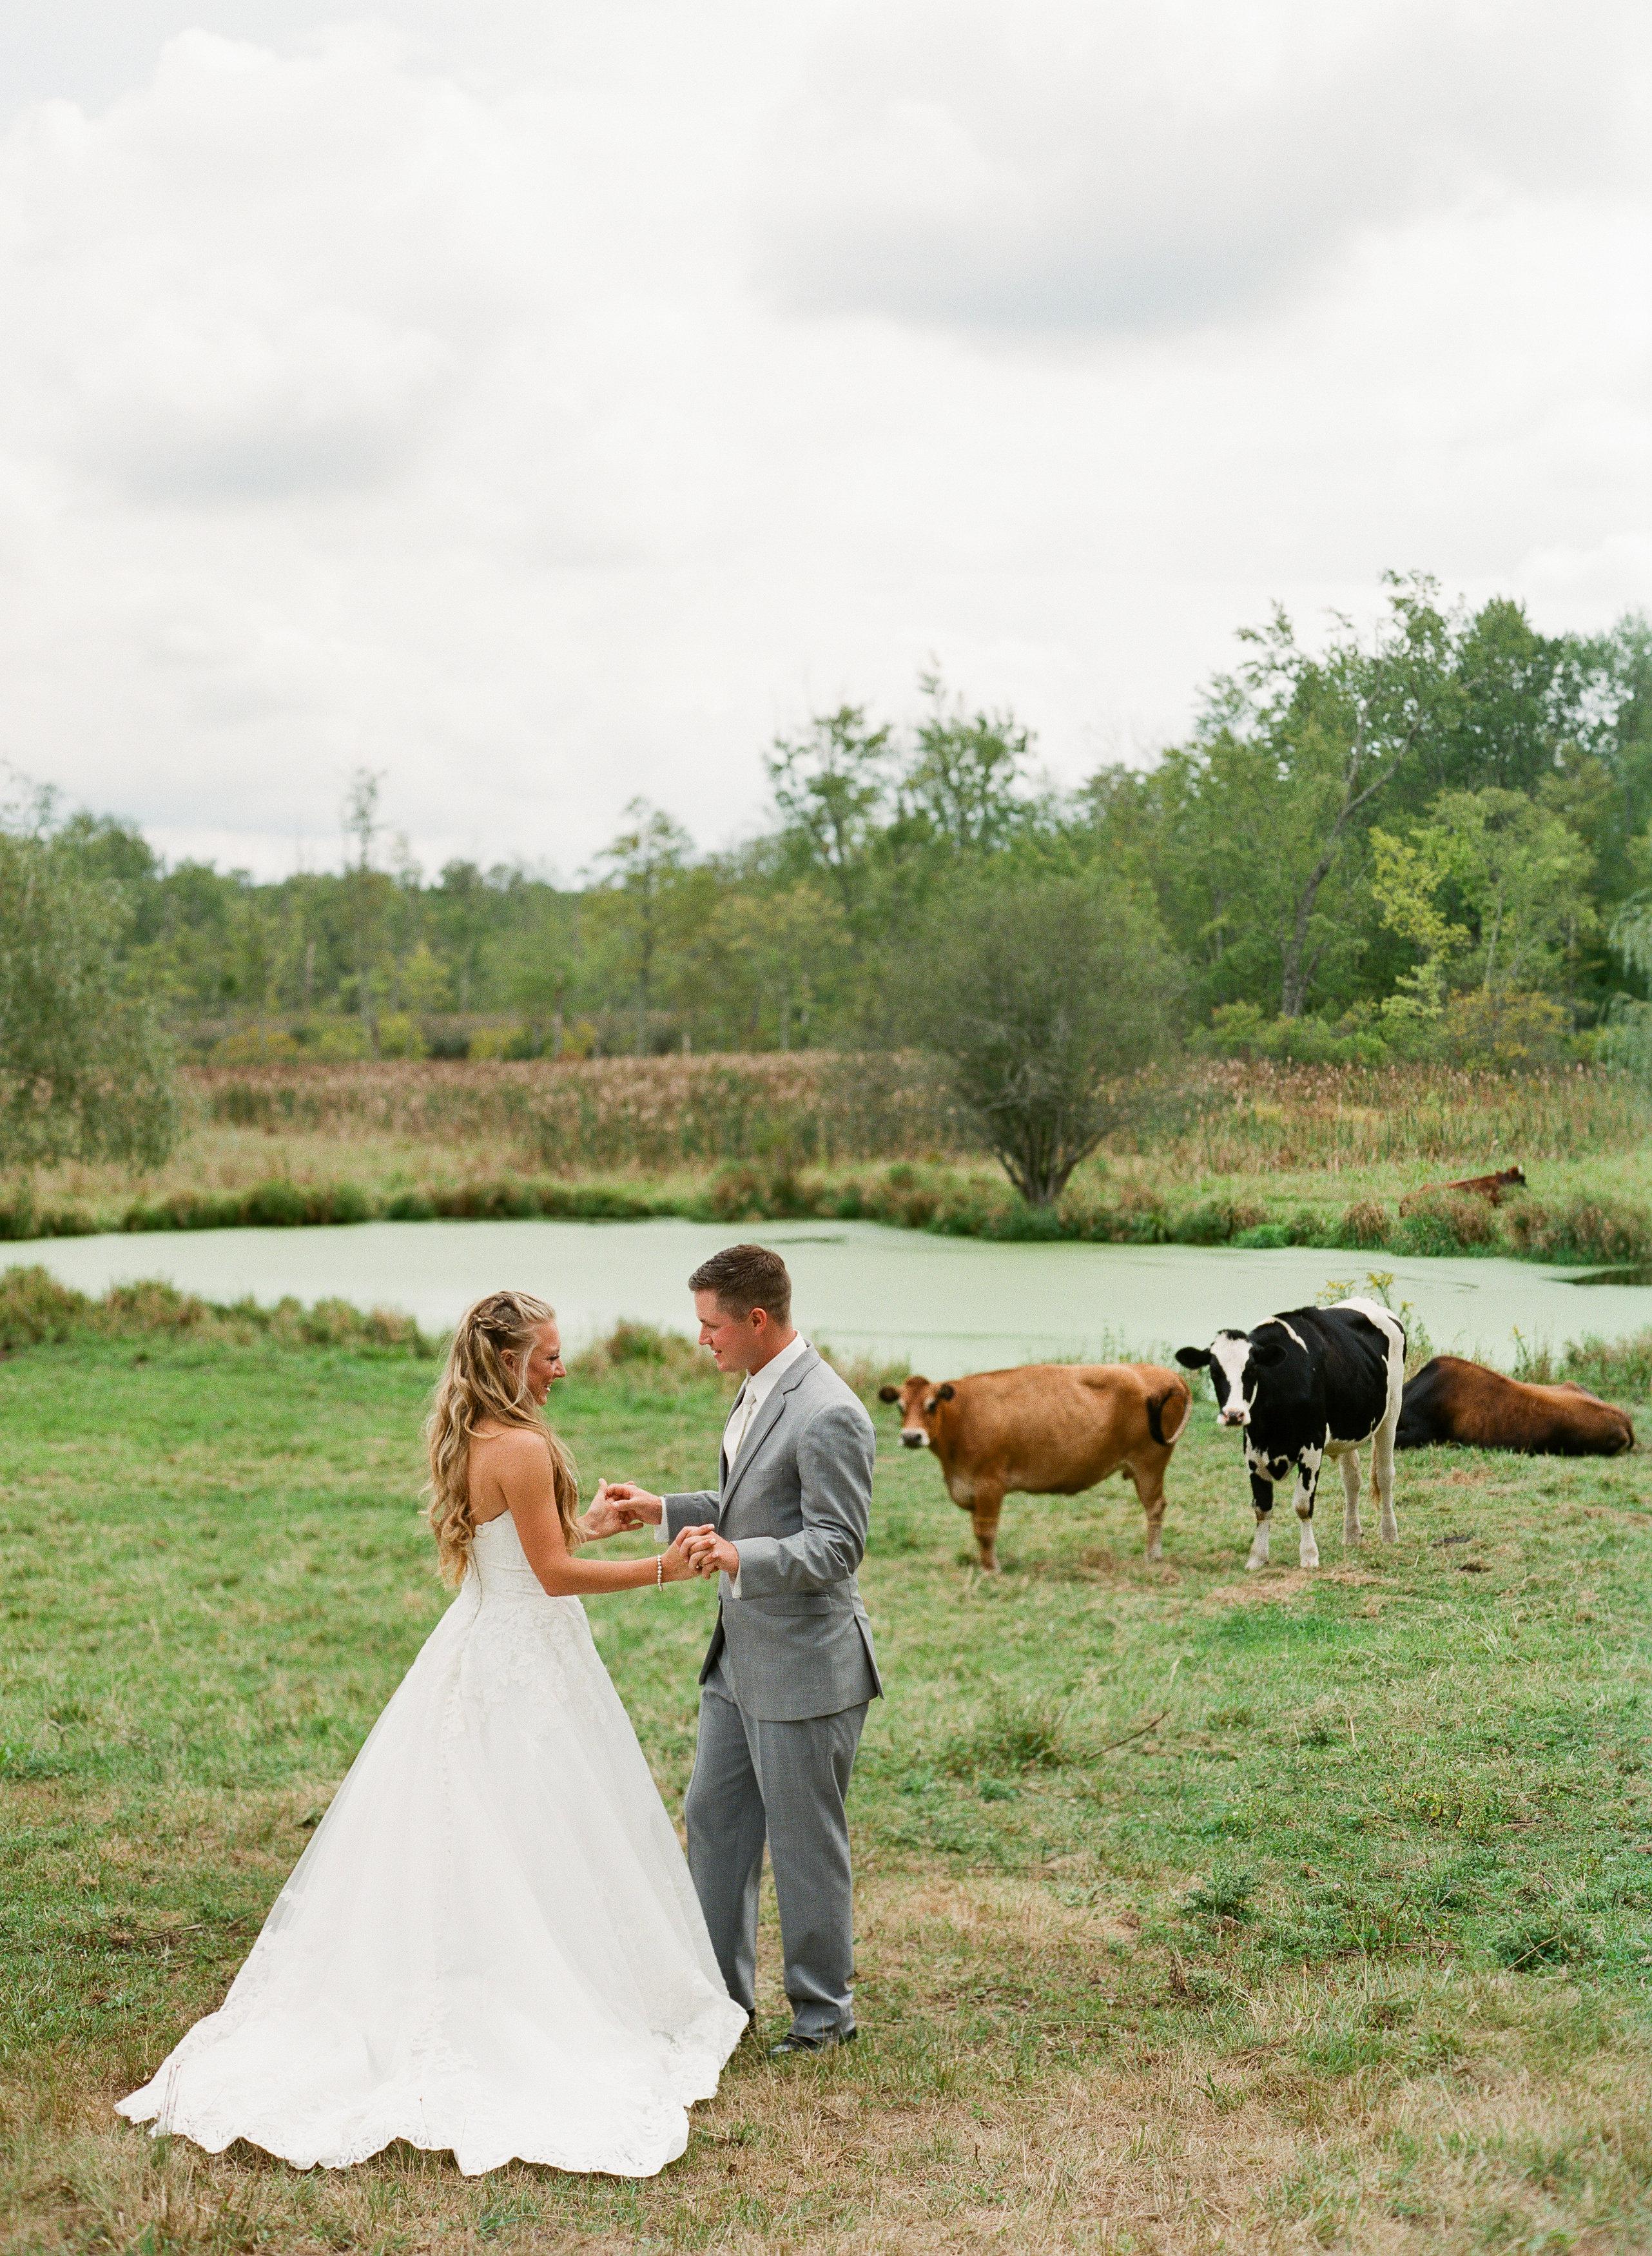 Stephanie&Dan-Wedding-LindsayMaddenPhotographyII-48